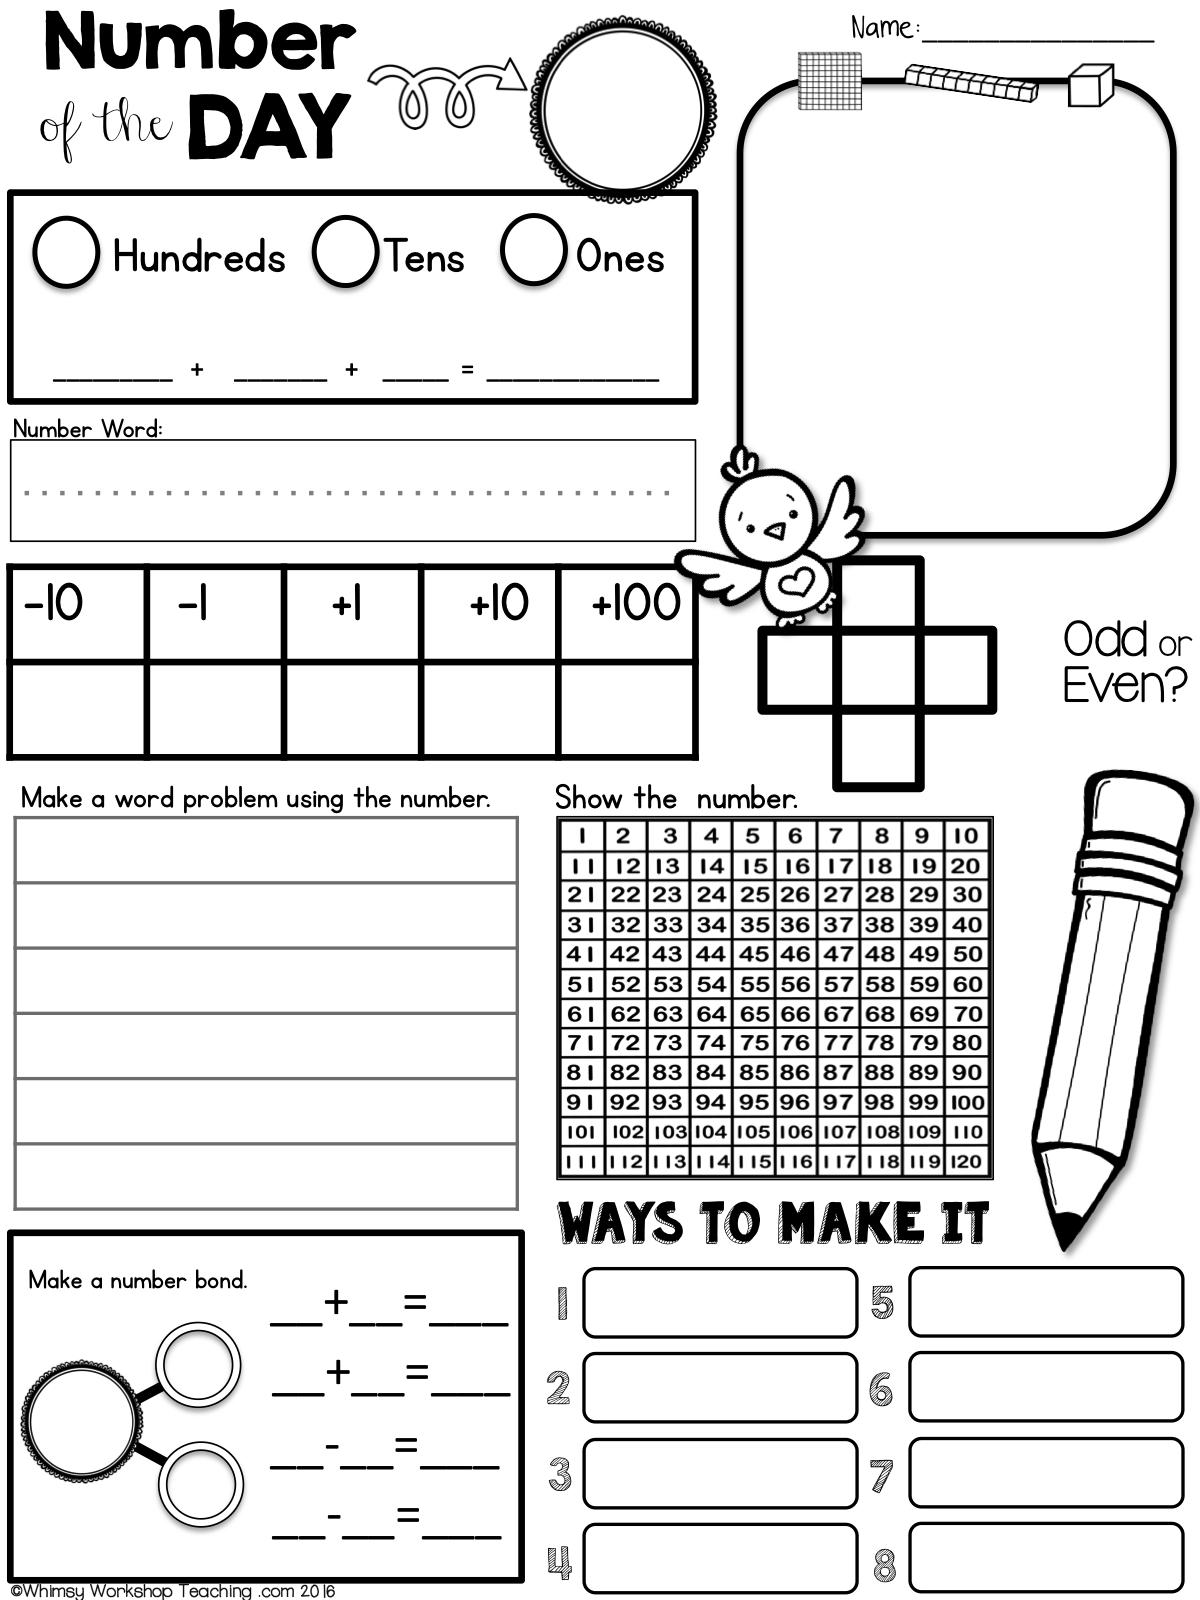 Math: 5 Steps to a Successful Program - Whimsy Workshop Teaching   Calendar  math [ 1600 x 1200 Pixel ]